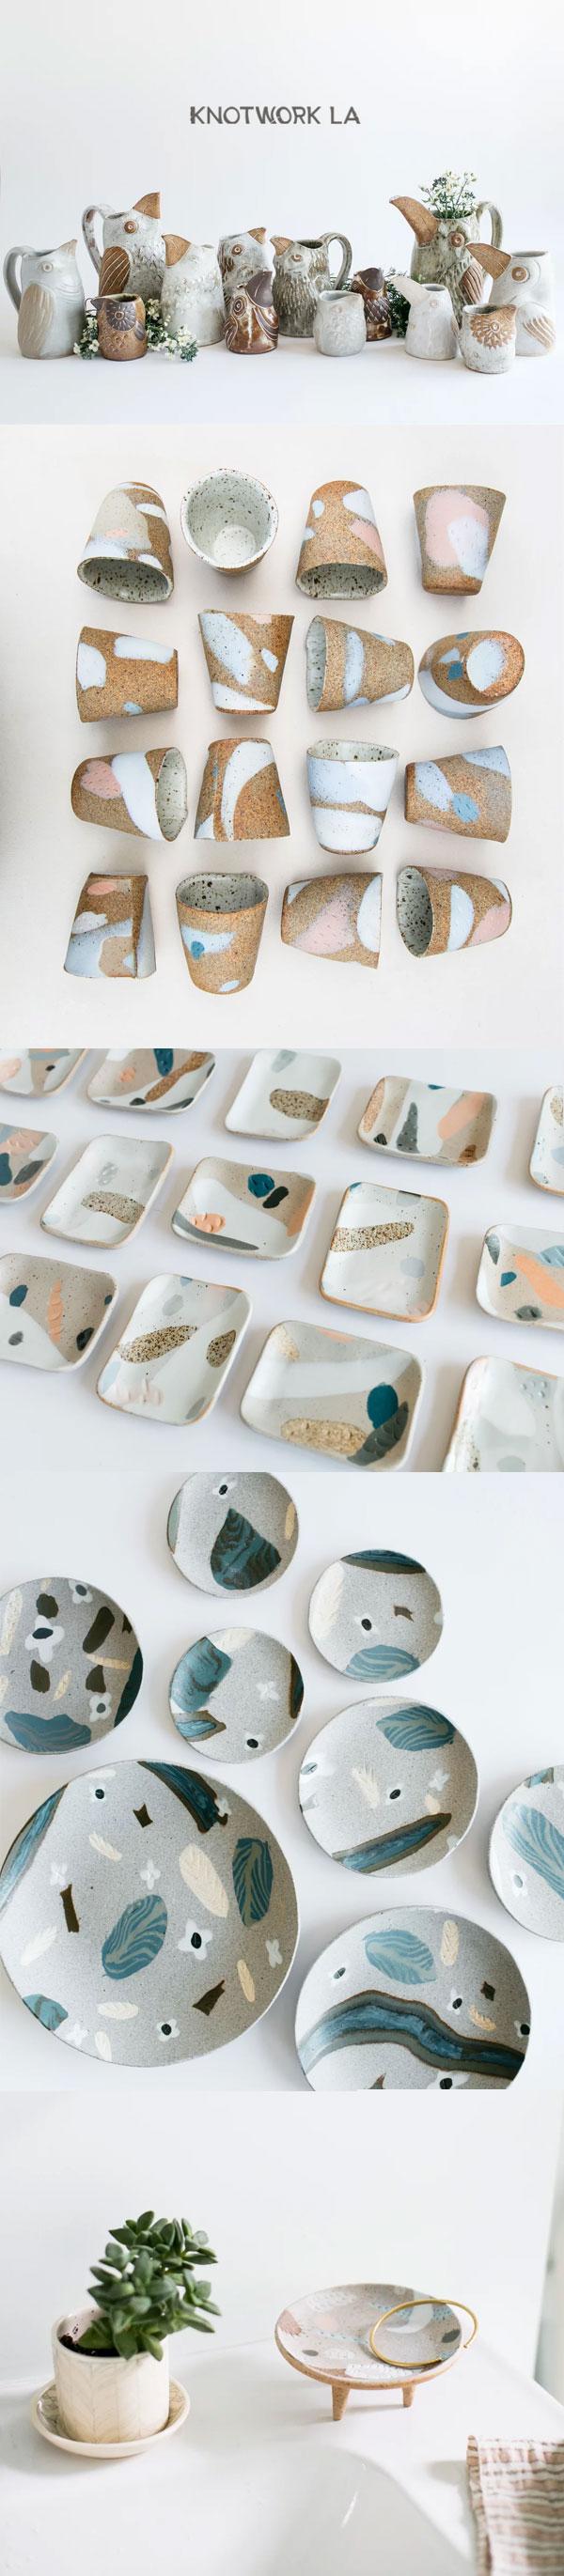 Knotwork LA | Cerâmica by Linda Hsiao